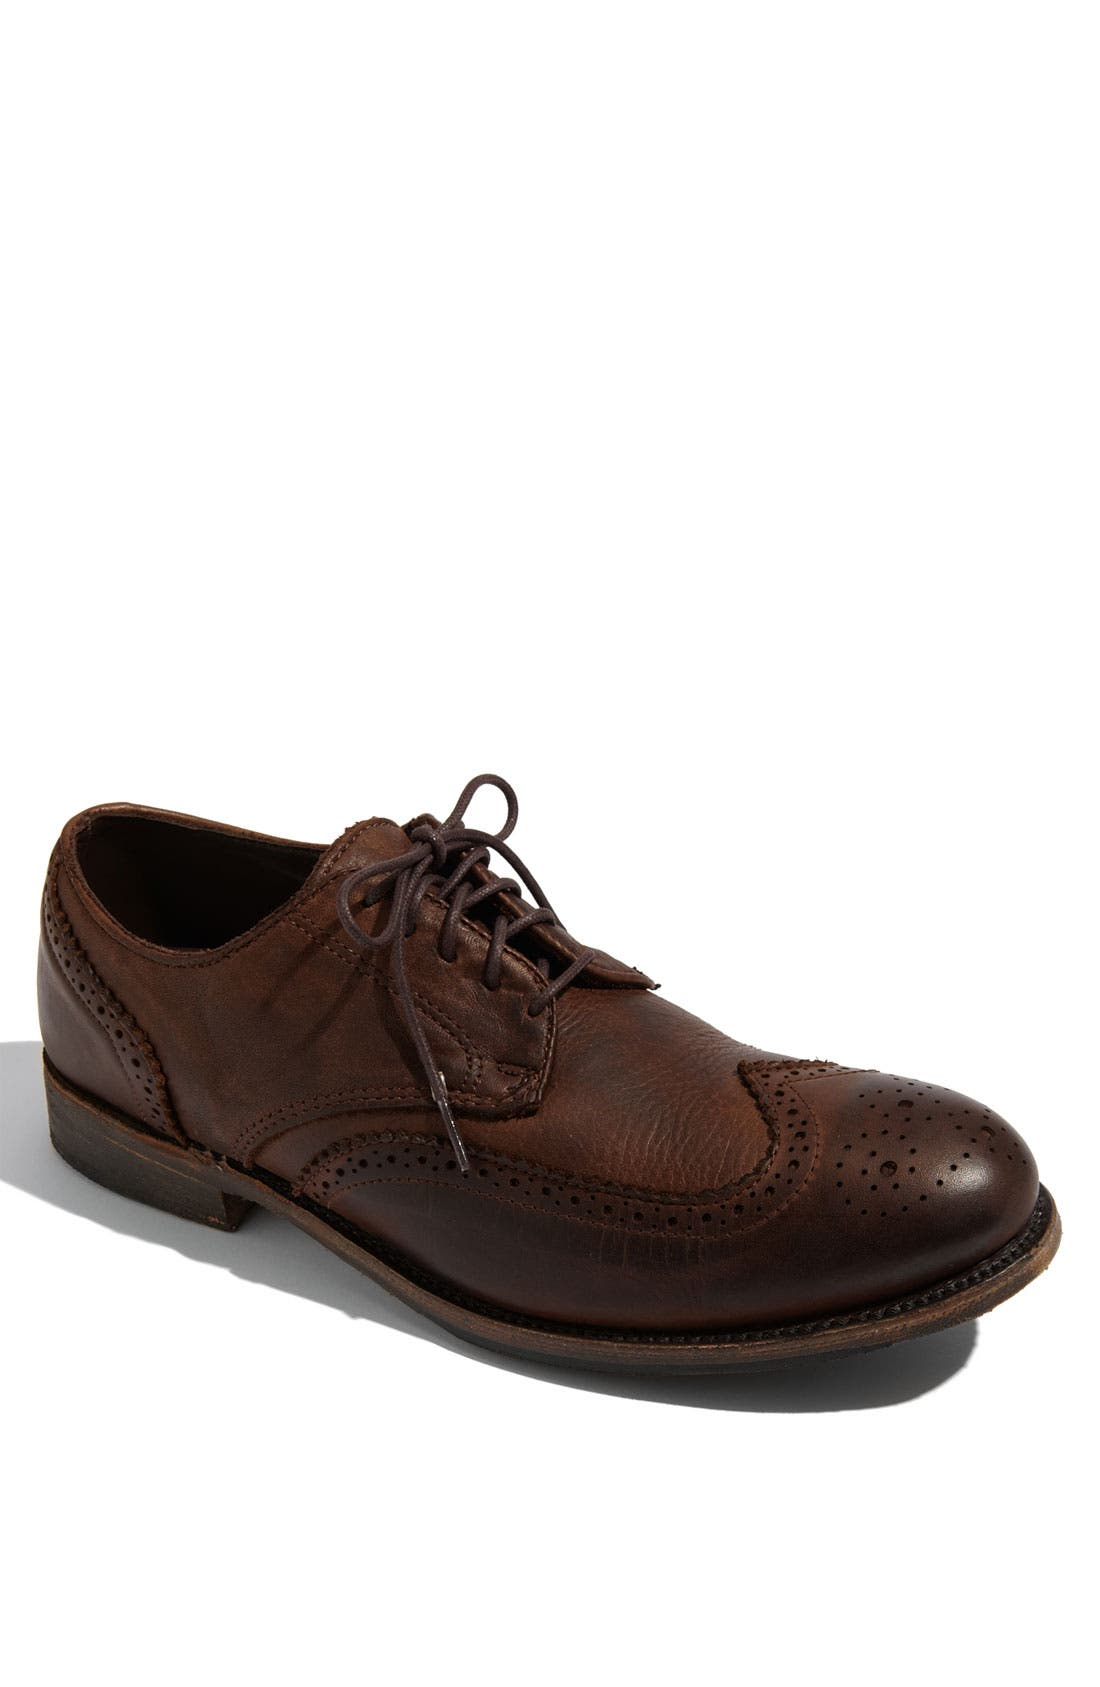 Alternate Image 1 Selected - Vintage Shoe Company 'Langdon' Wingtip Oxford